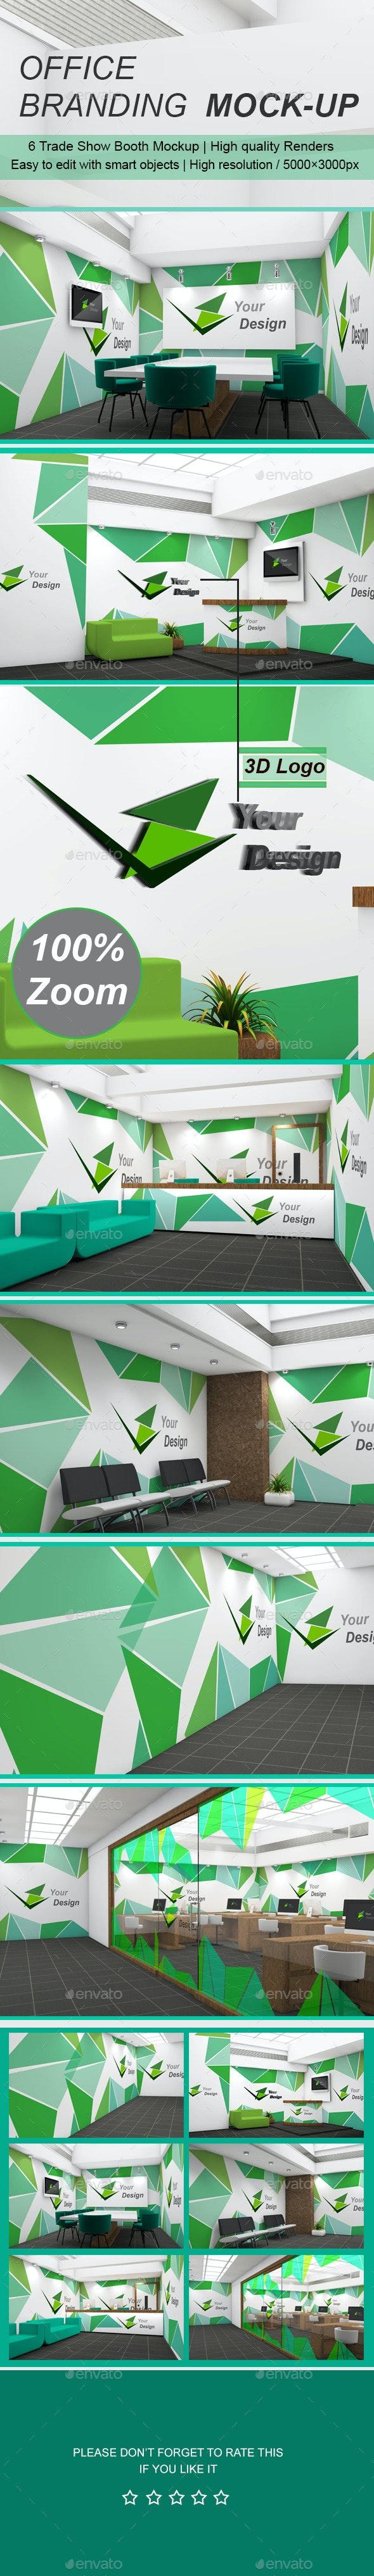 Office Branding Mock-up  - Logo Product Mock-Ups